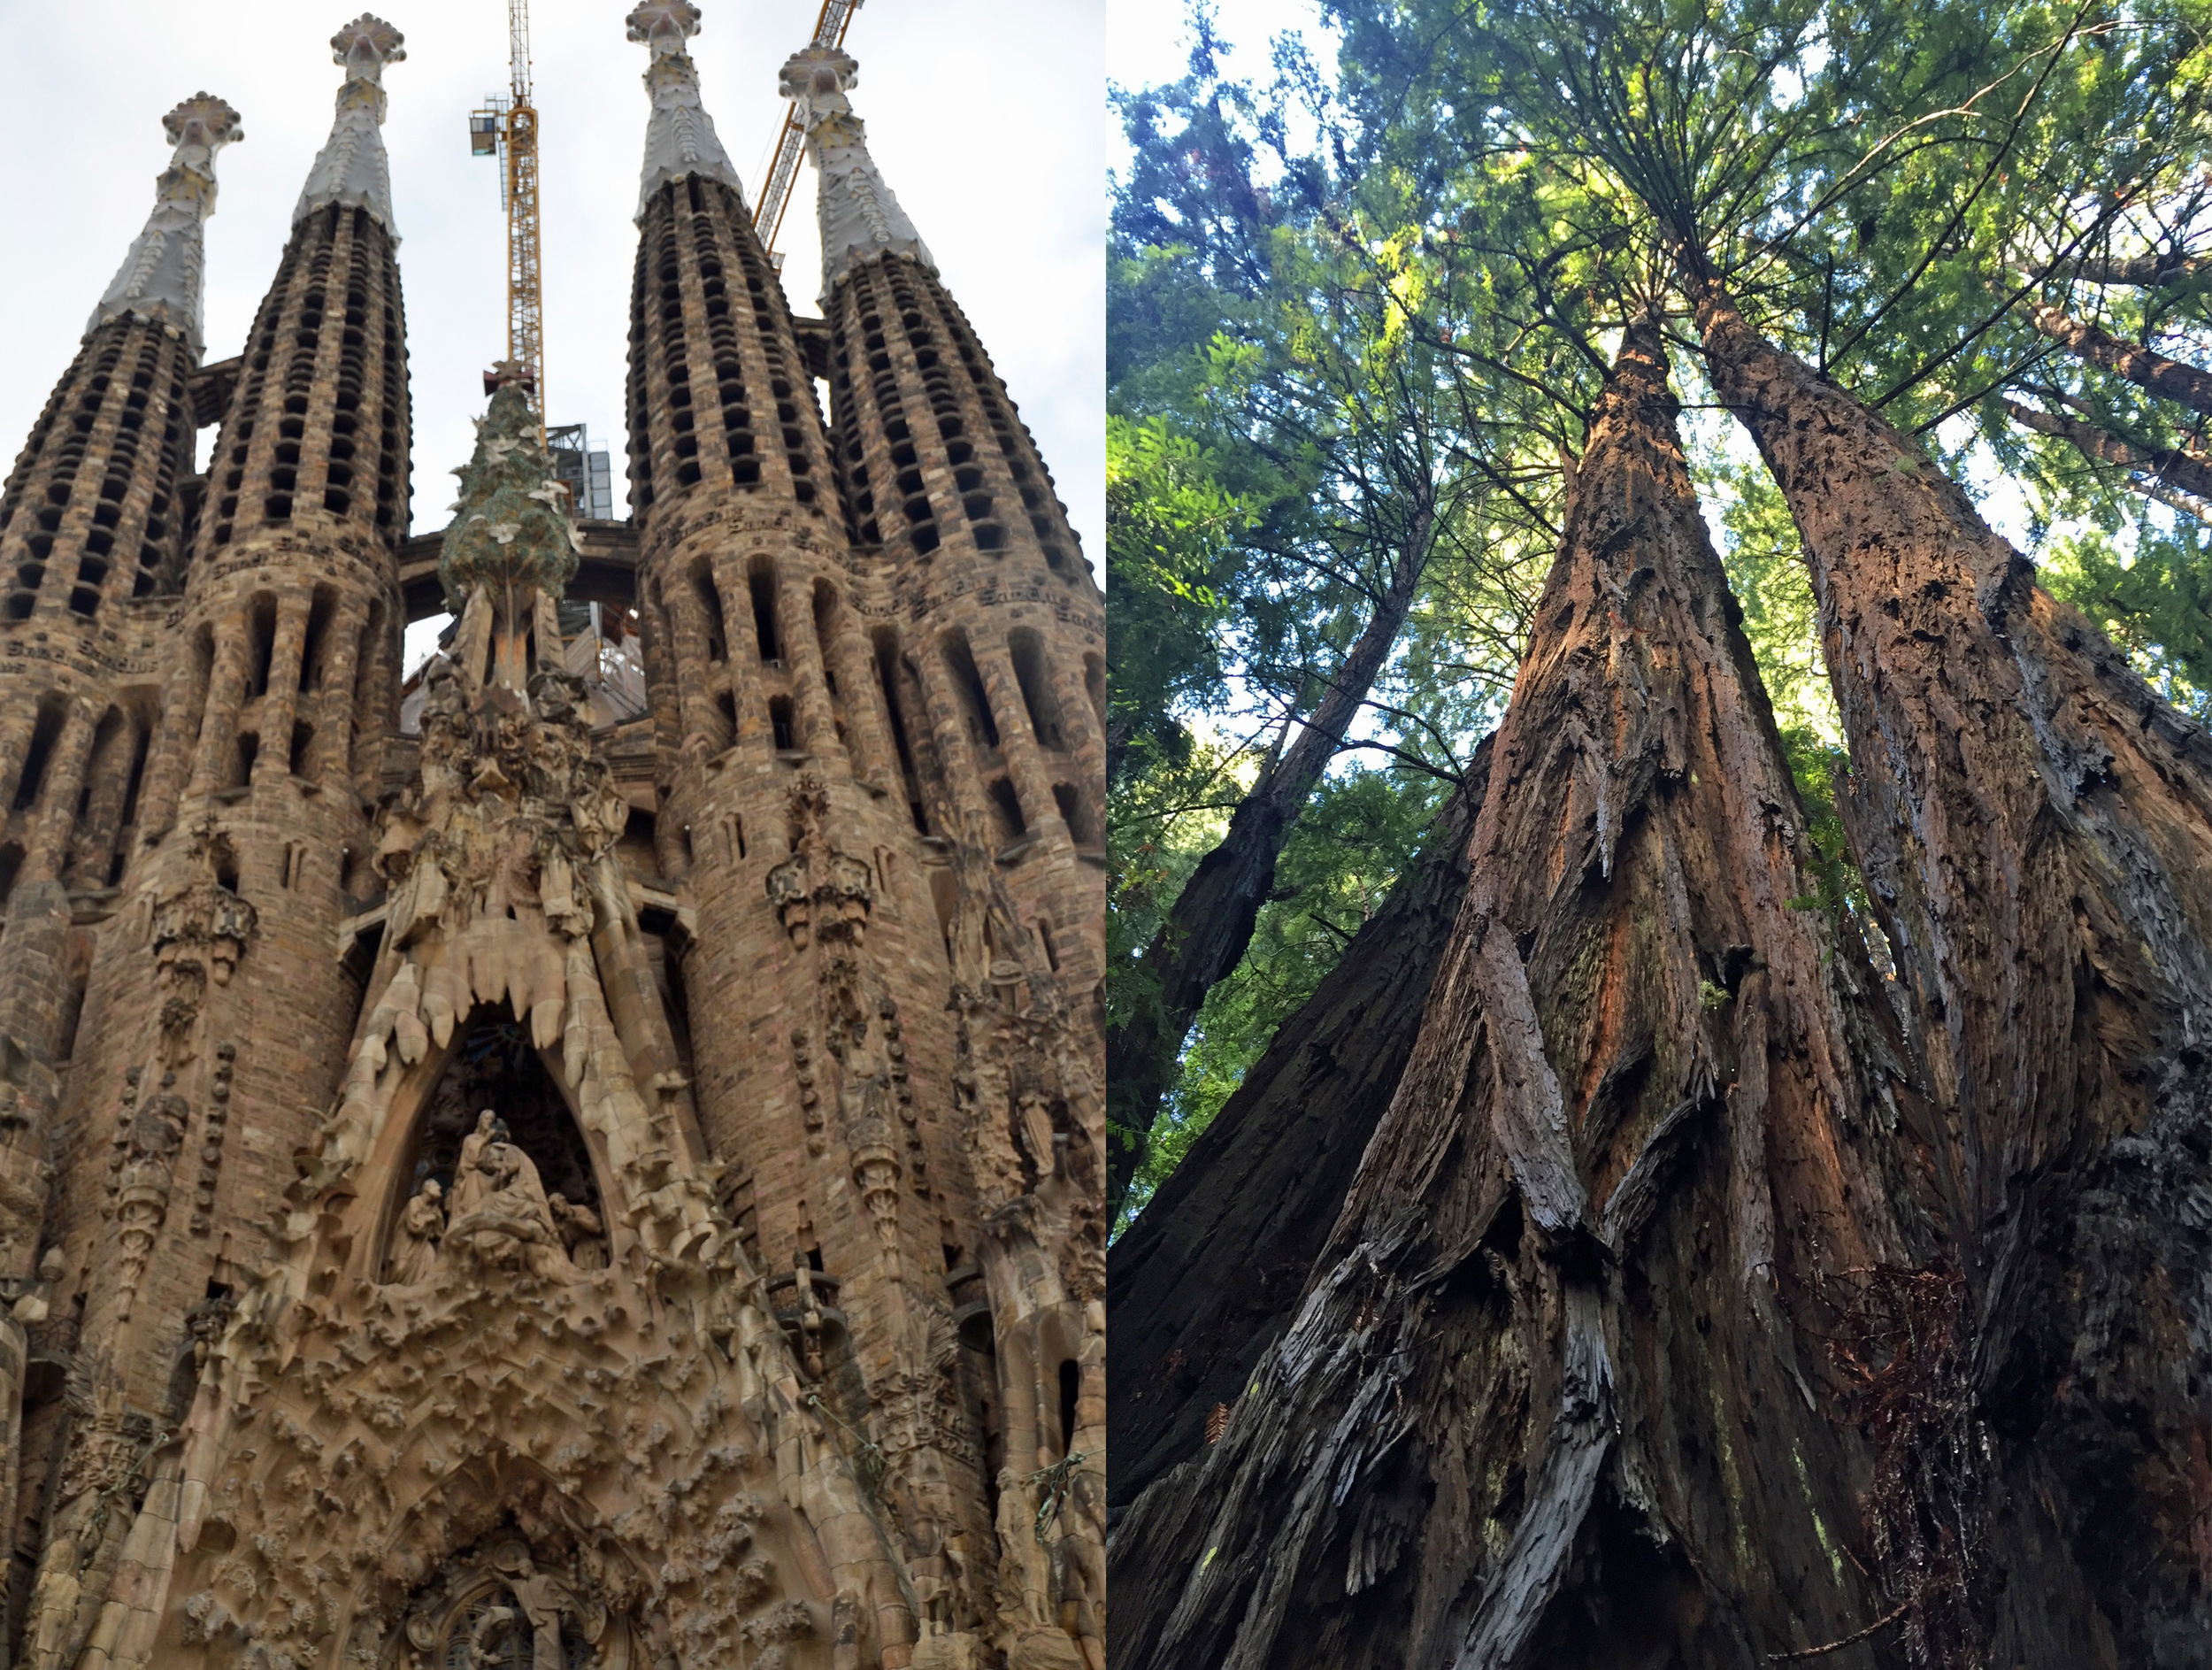 La Sagrada Familia (October 2015) and Muir Woods (January 2016).